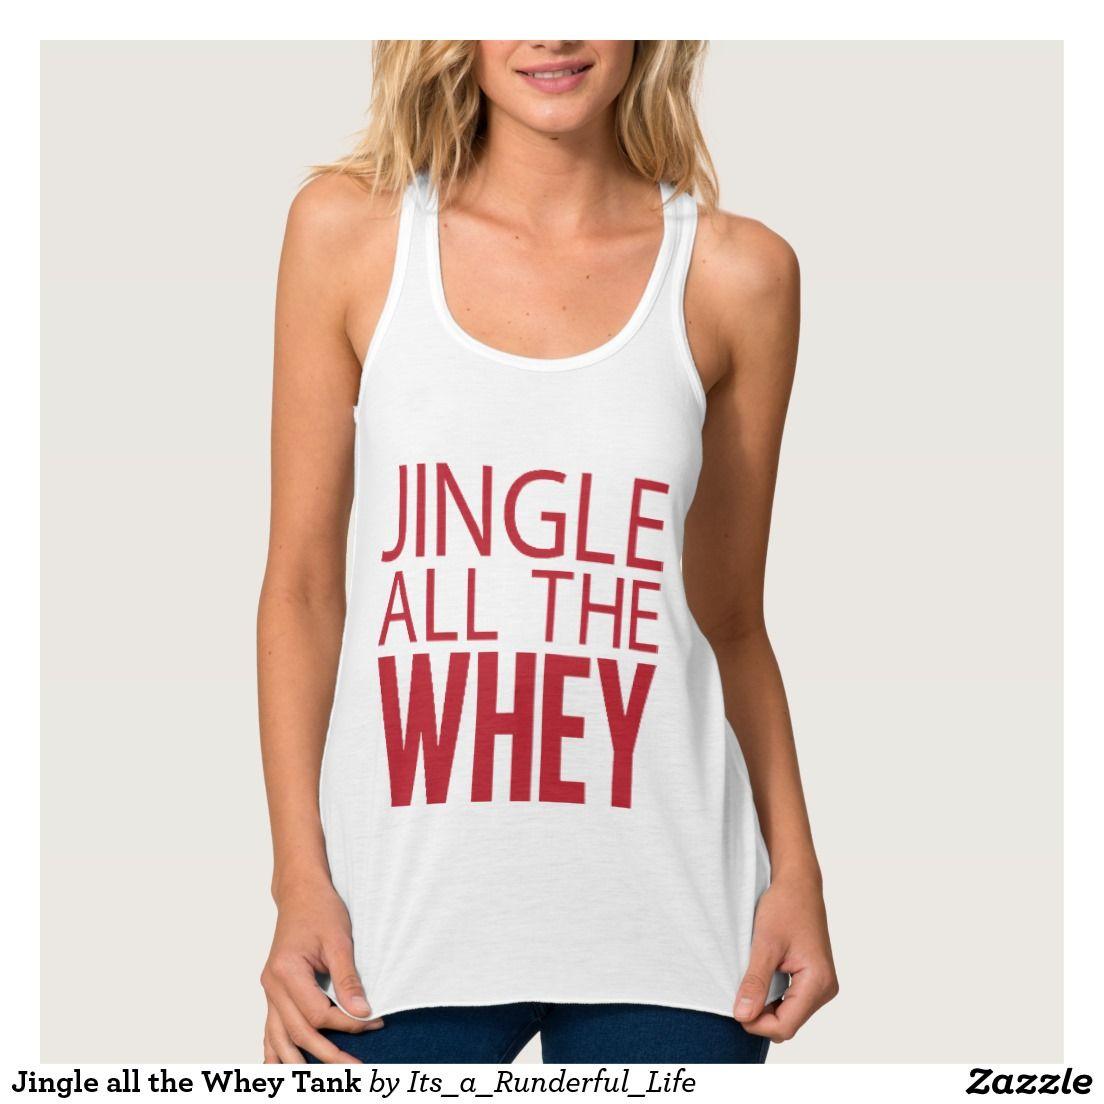 1c38c3c380f9d Jingle all the Whey Tank  itsarunderfullife  run  swim  bike  crossfit   yoga  health  lift  gym  fitness  mom  mother  quote  tee  tshirt  sweat   workout ...